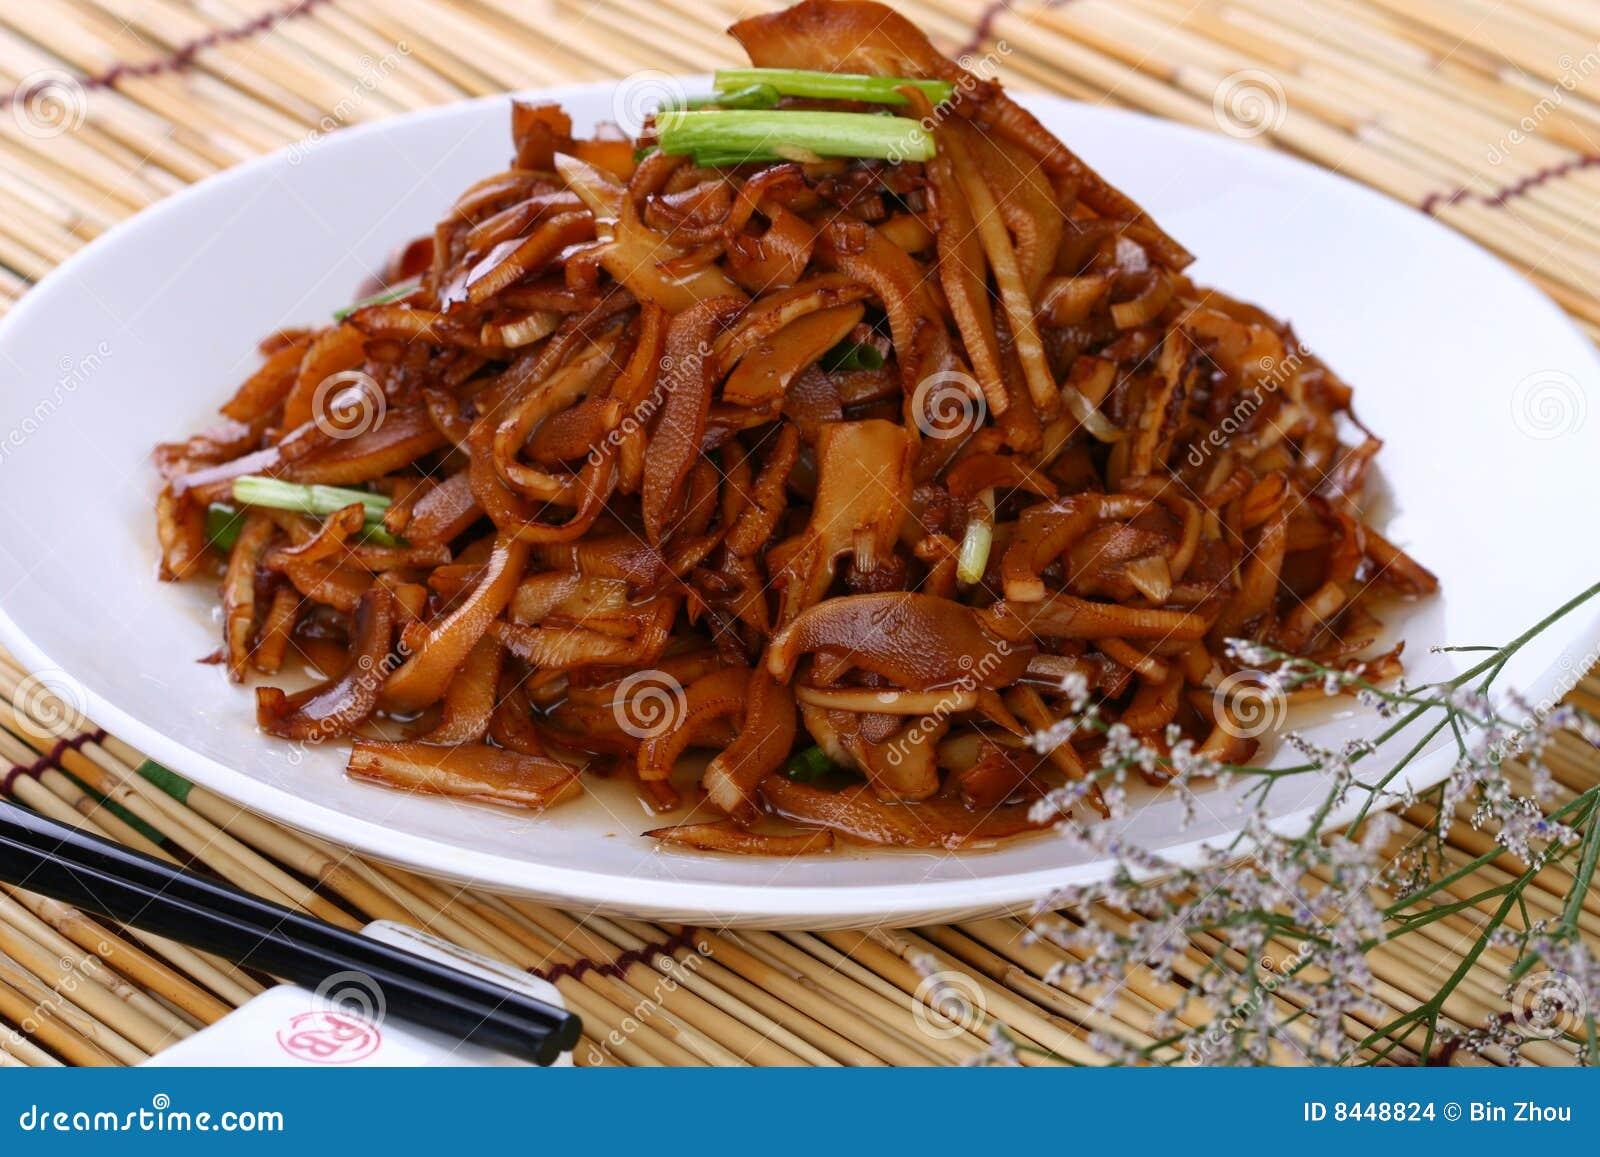 Fry asian food shrimp